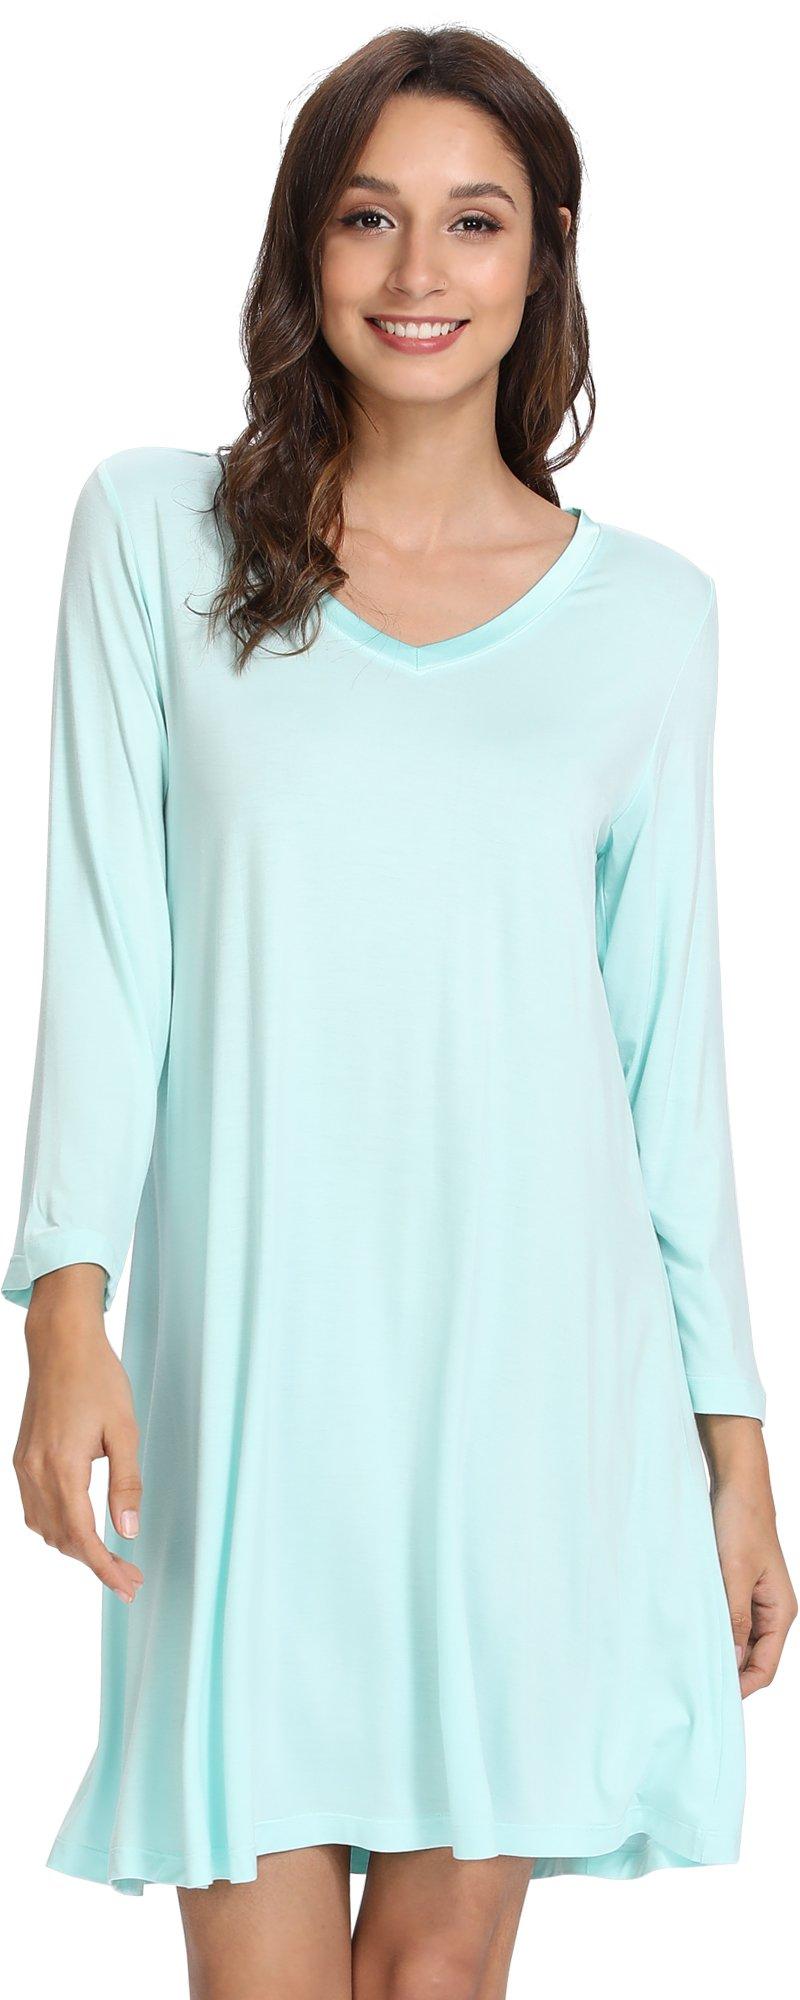 WiWi Bamboo Soft Long Sleeve Nightgowns Stretchy Sleepwear Plus Size Sleep Dress Nightwear for Women S-4X